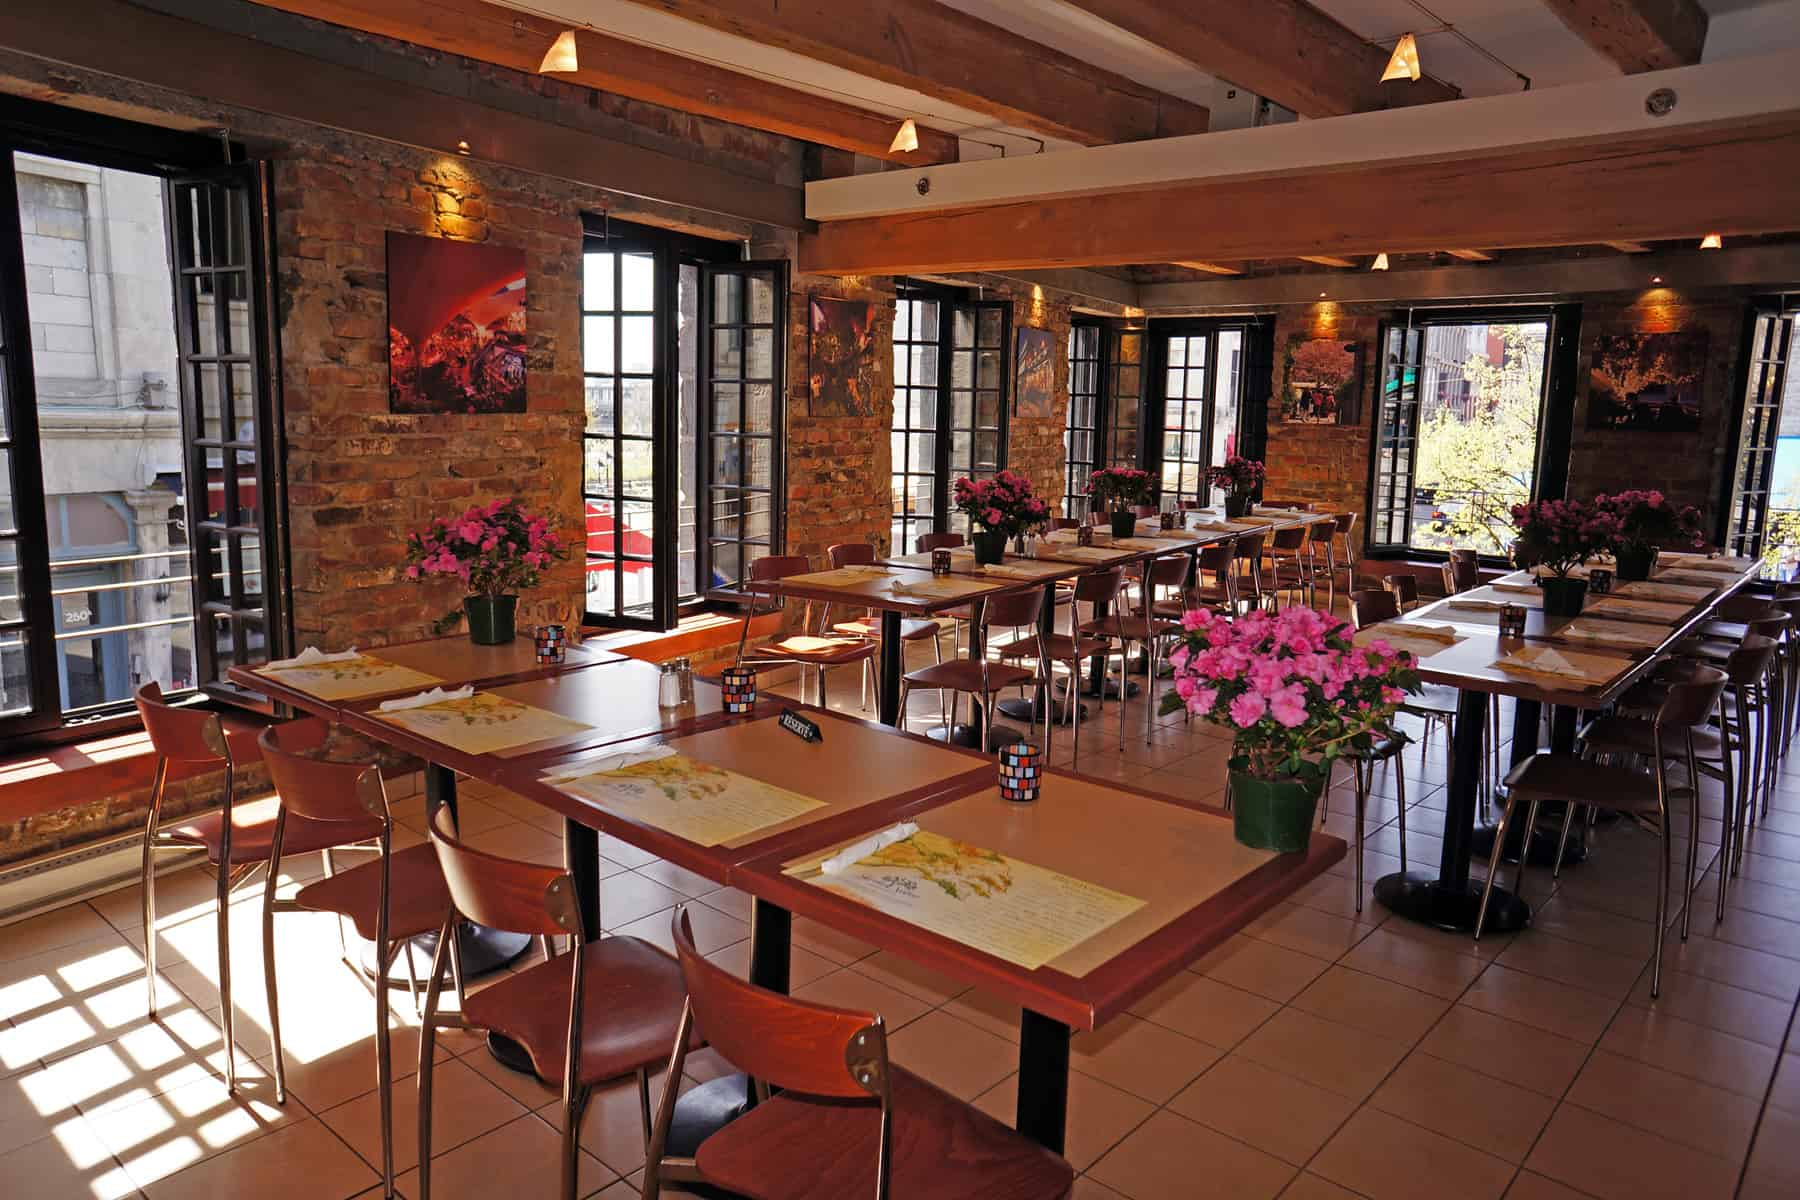 Salle cartier jardin nelson for Jardin nelson montreal menu